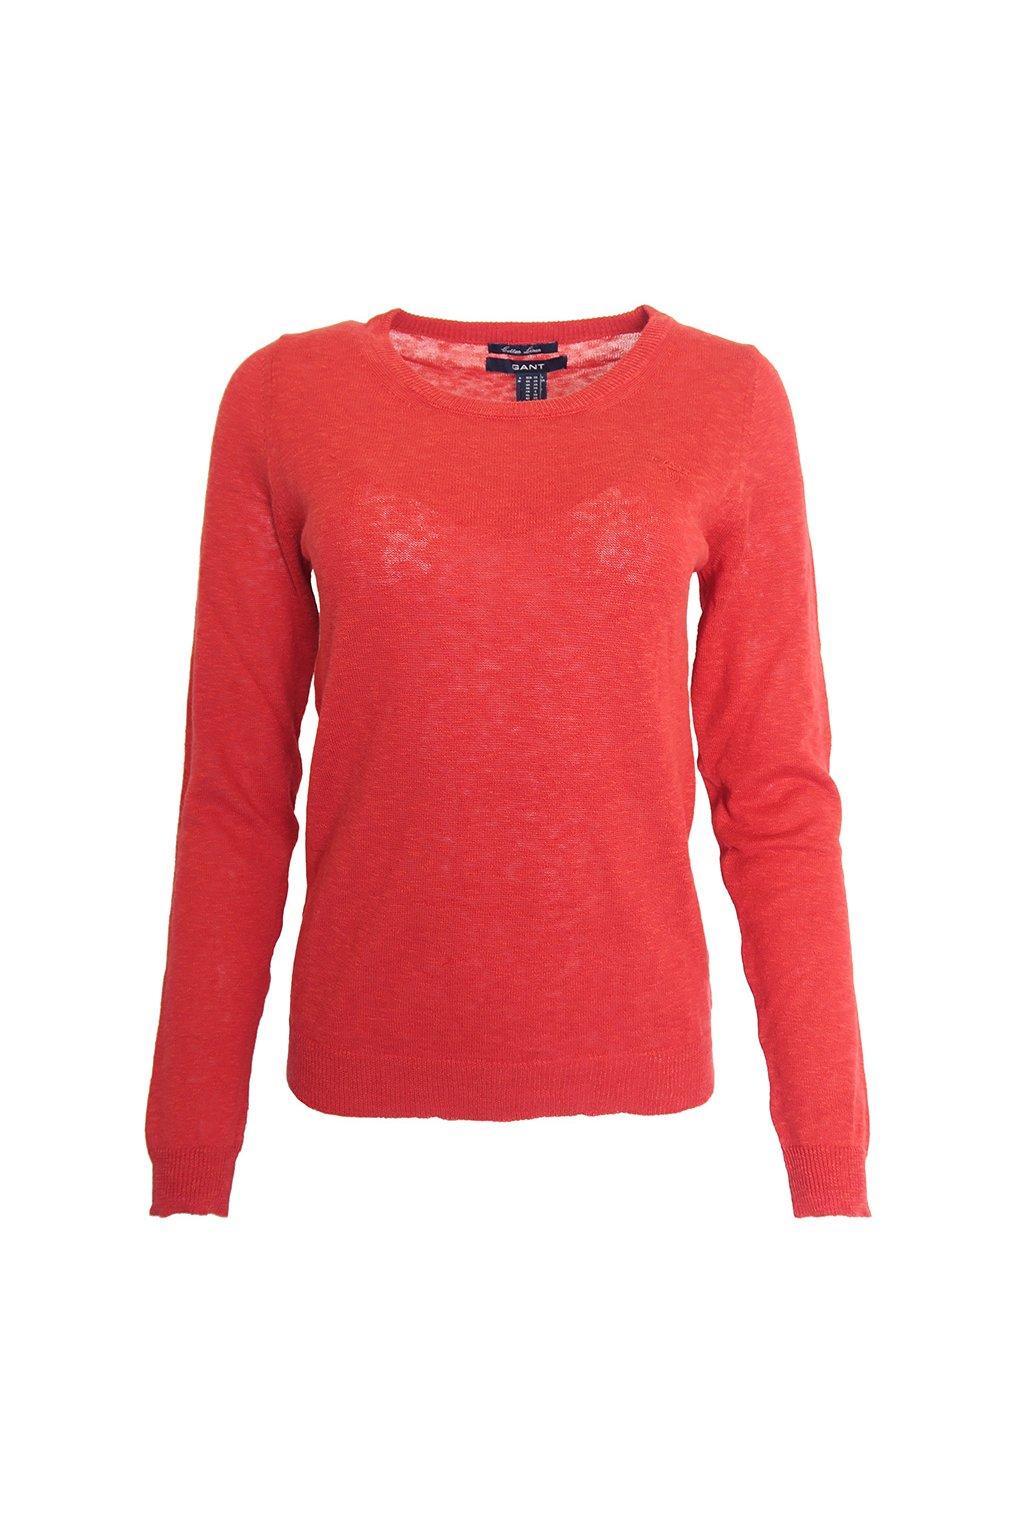 Červený tenký svetřík Gant